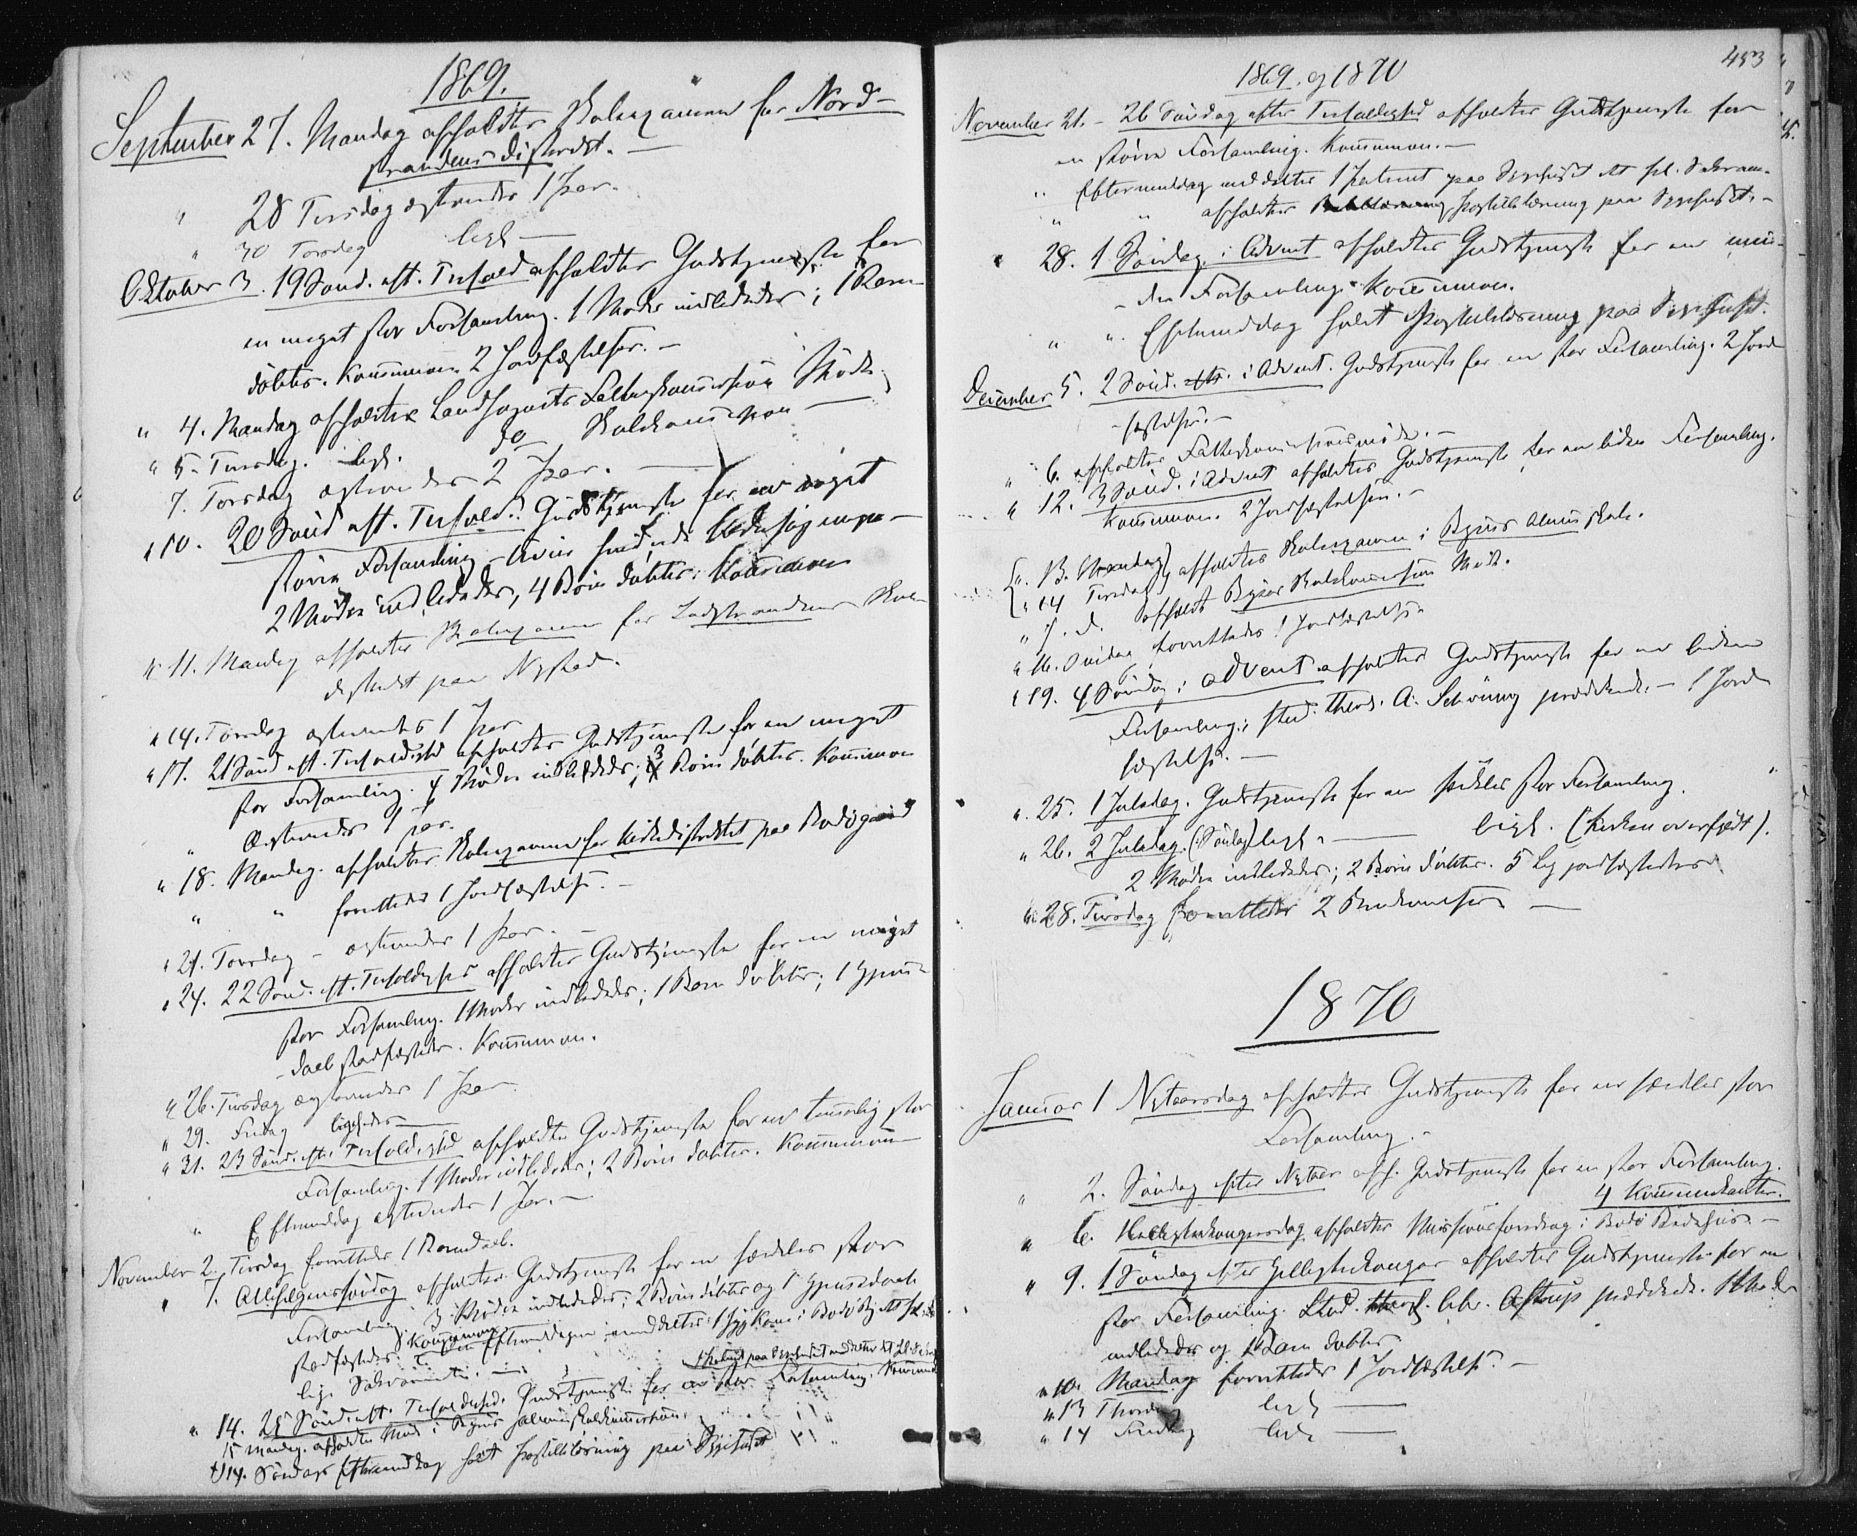 SAT, Ministerialprotokoller, klokkerbøker og fødselsregistre - Nordland, 801/L0008: Ministerialbok nr. 801A08, 1864-1875, s. 453